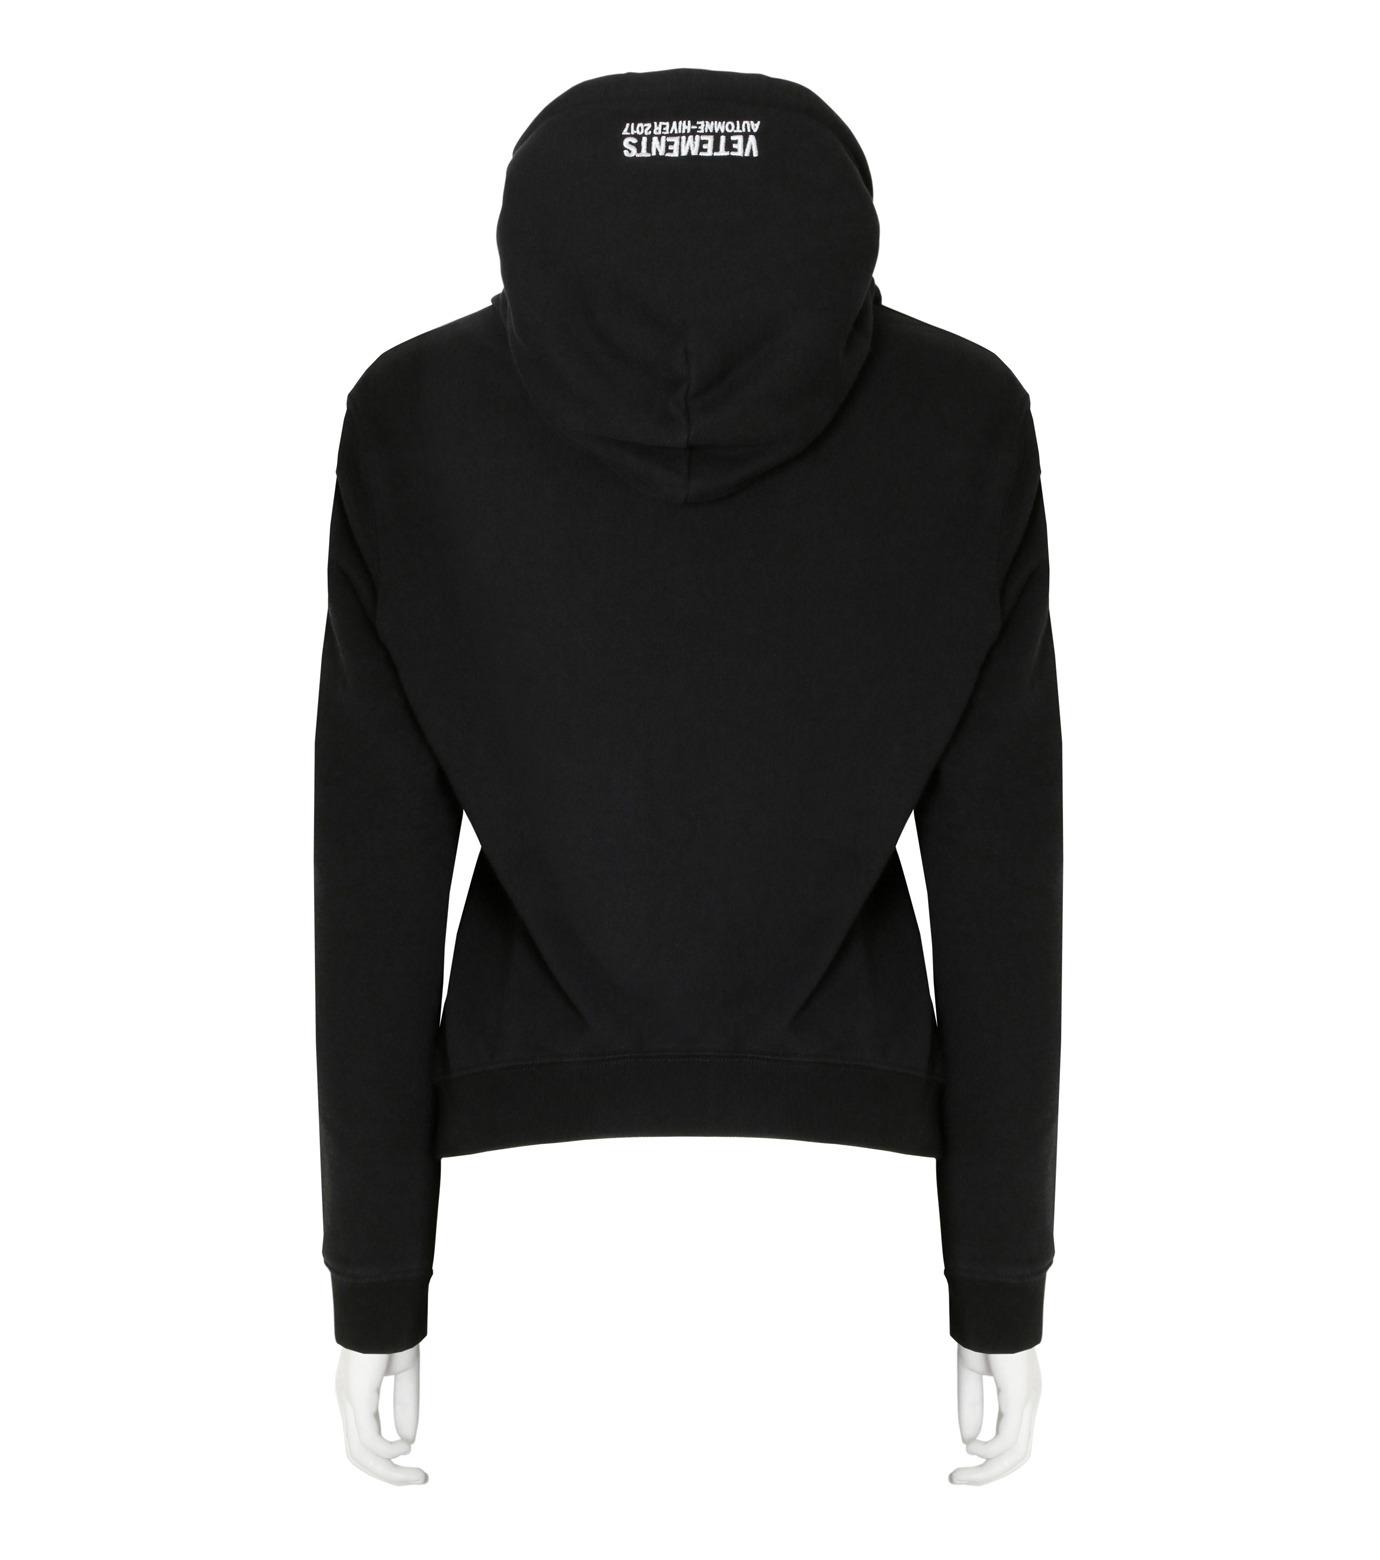 VETEMENTS(ヴェトモン)のShrunk Hoodie-BLACK(カットソー/cut and sewn)-WF17TP15-13 拡大詳細画像2